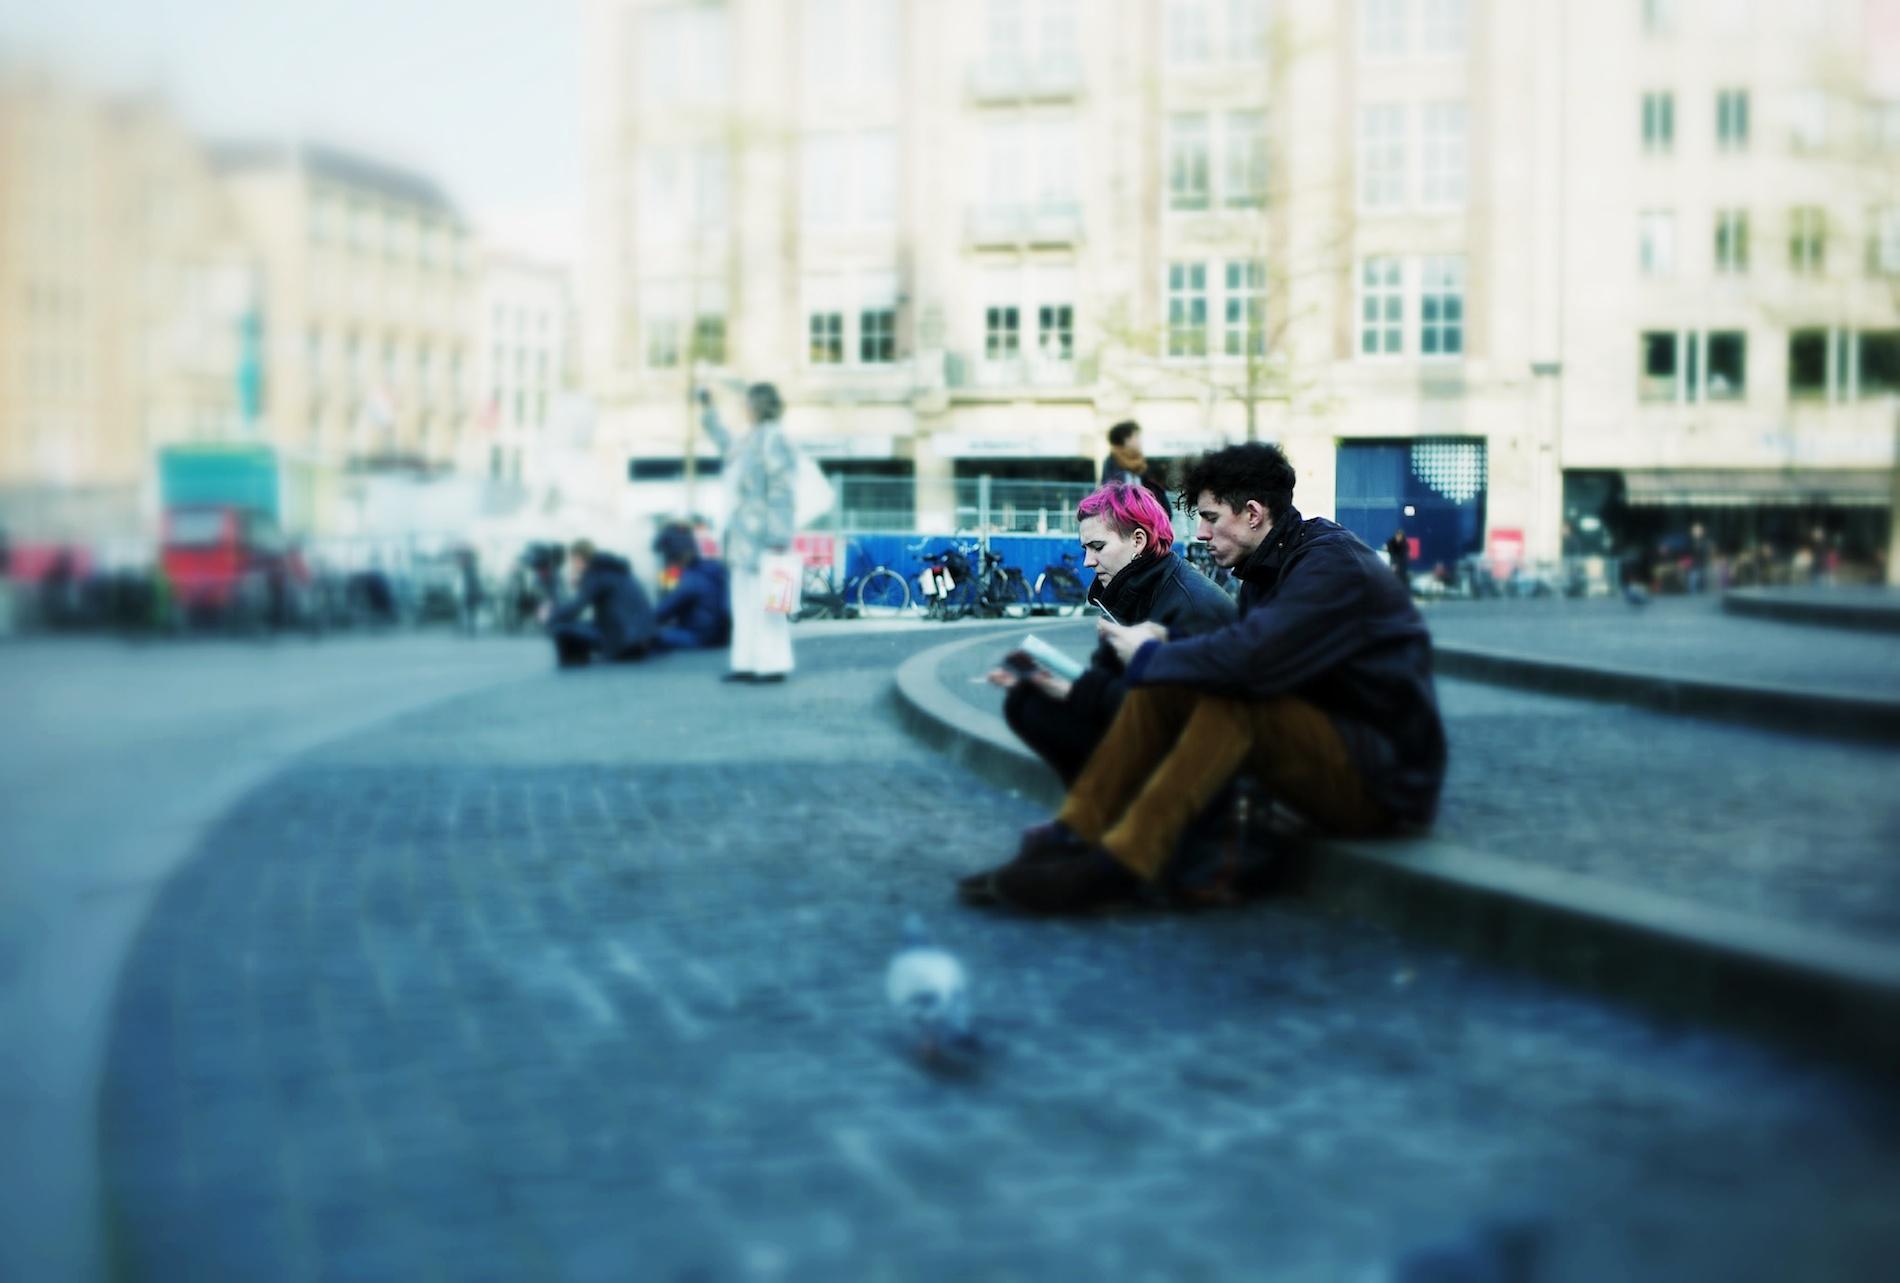 2011-11-08 at 14-32-41, Amsterdam.jpg